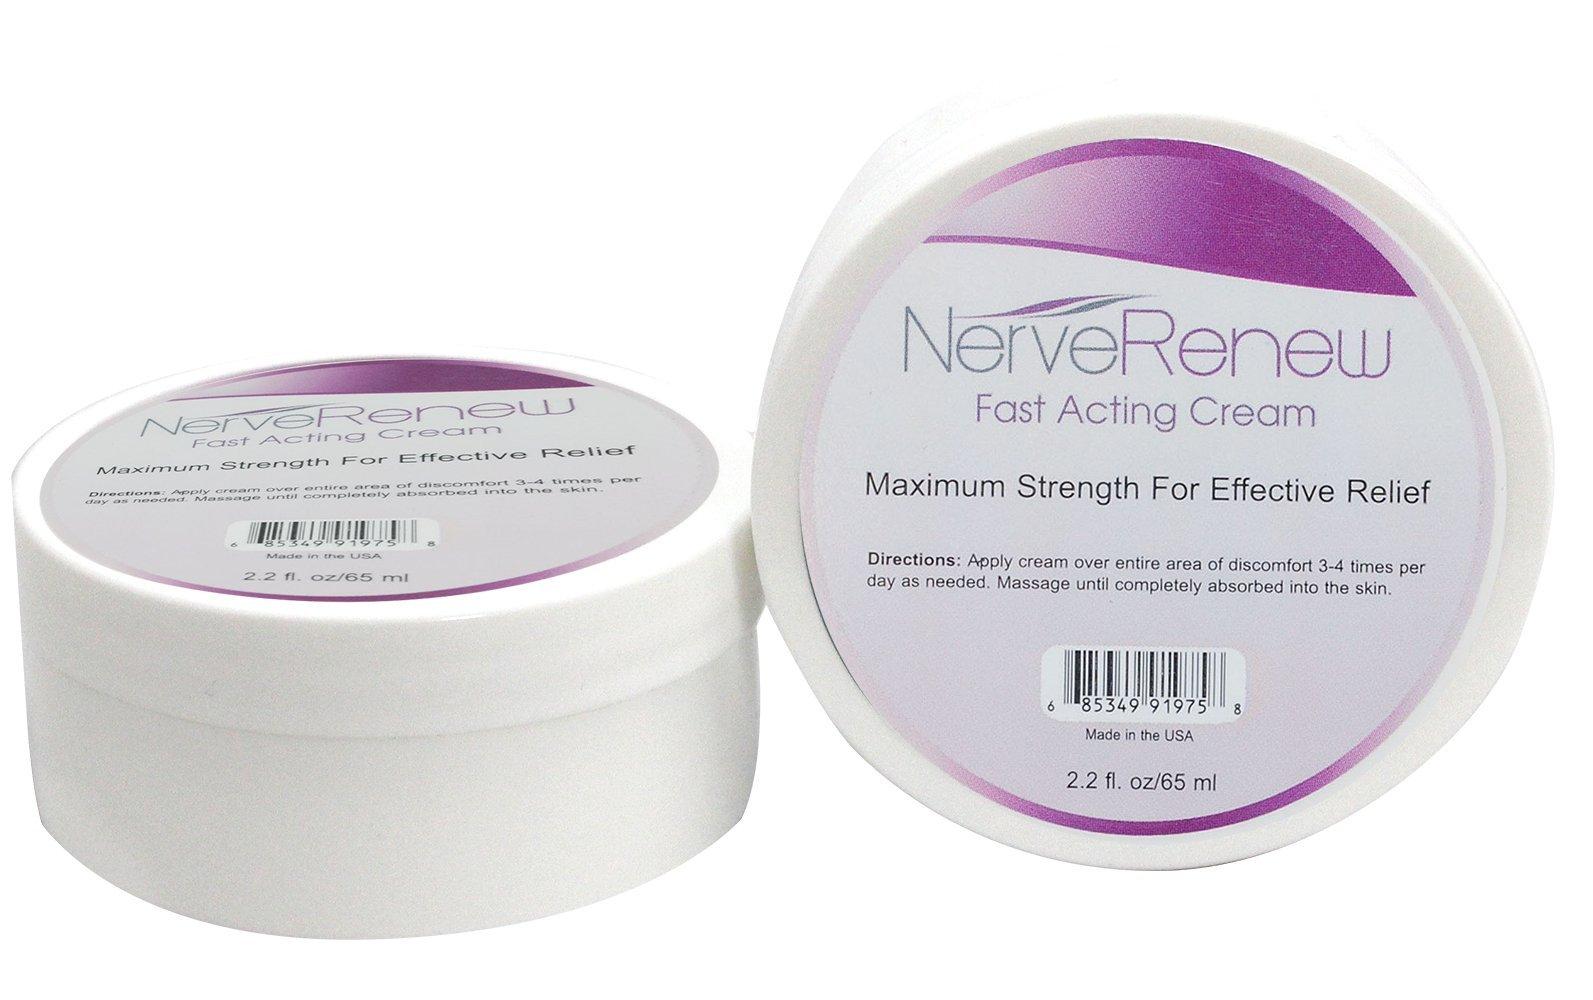 All-Natural Nerve Renew Fast Acting Cream - Absorbs Fast - Safe for Rheumatoid Arthritis - Alternative Nerve Pain Treatment - 2.2 Ounce Jar